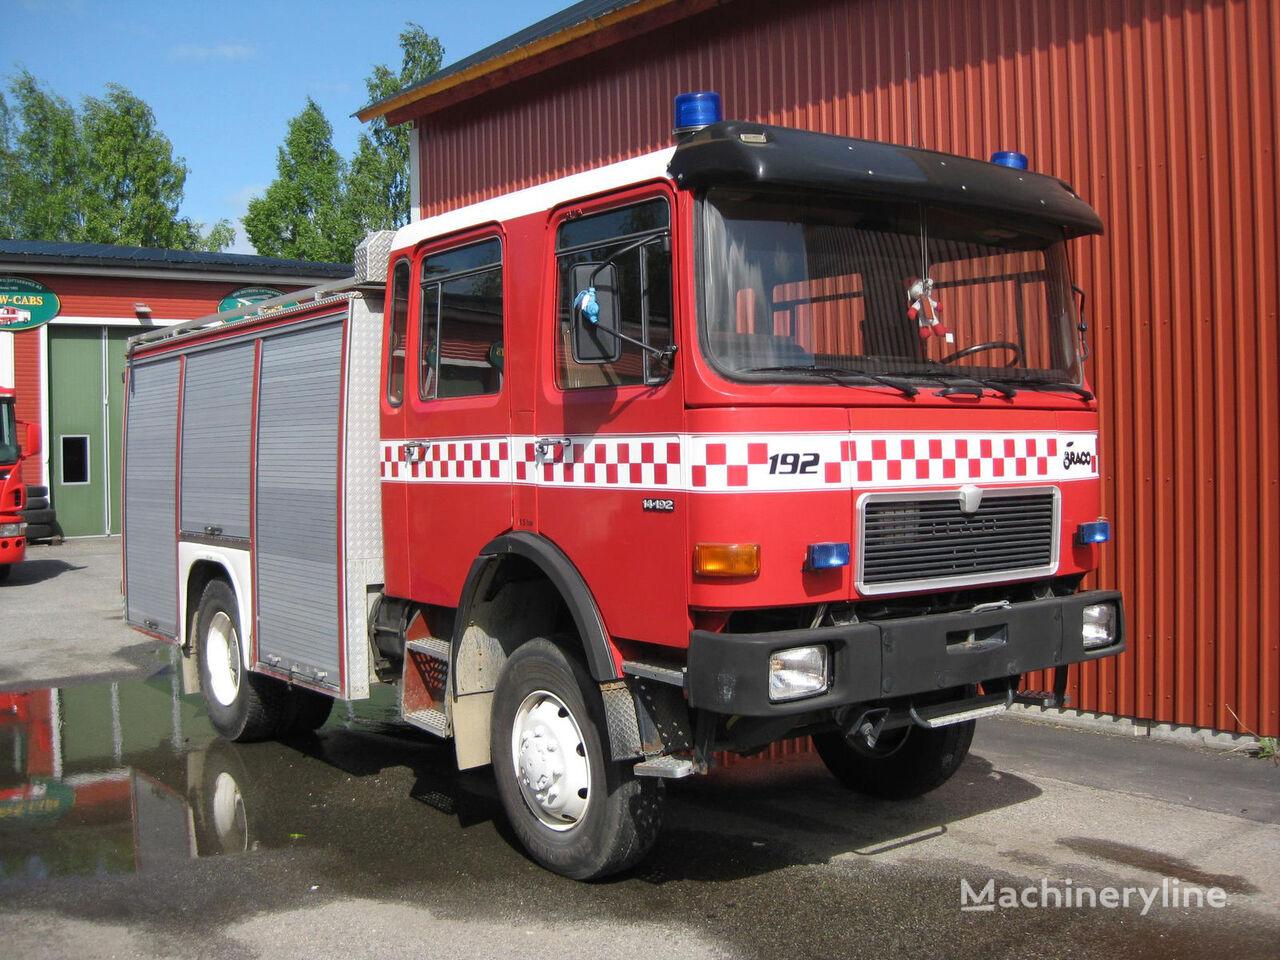 пожарная автоцистерна MAN 14-192, 4x4 WD